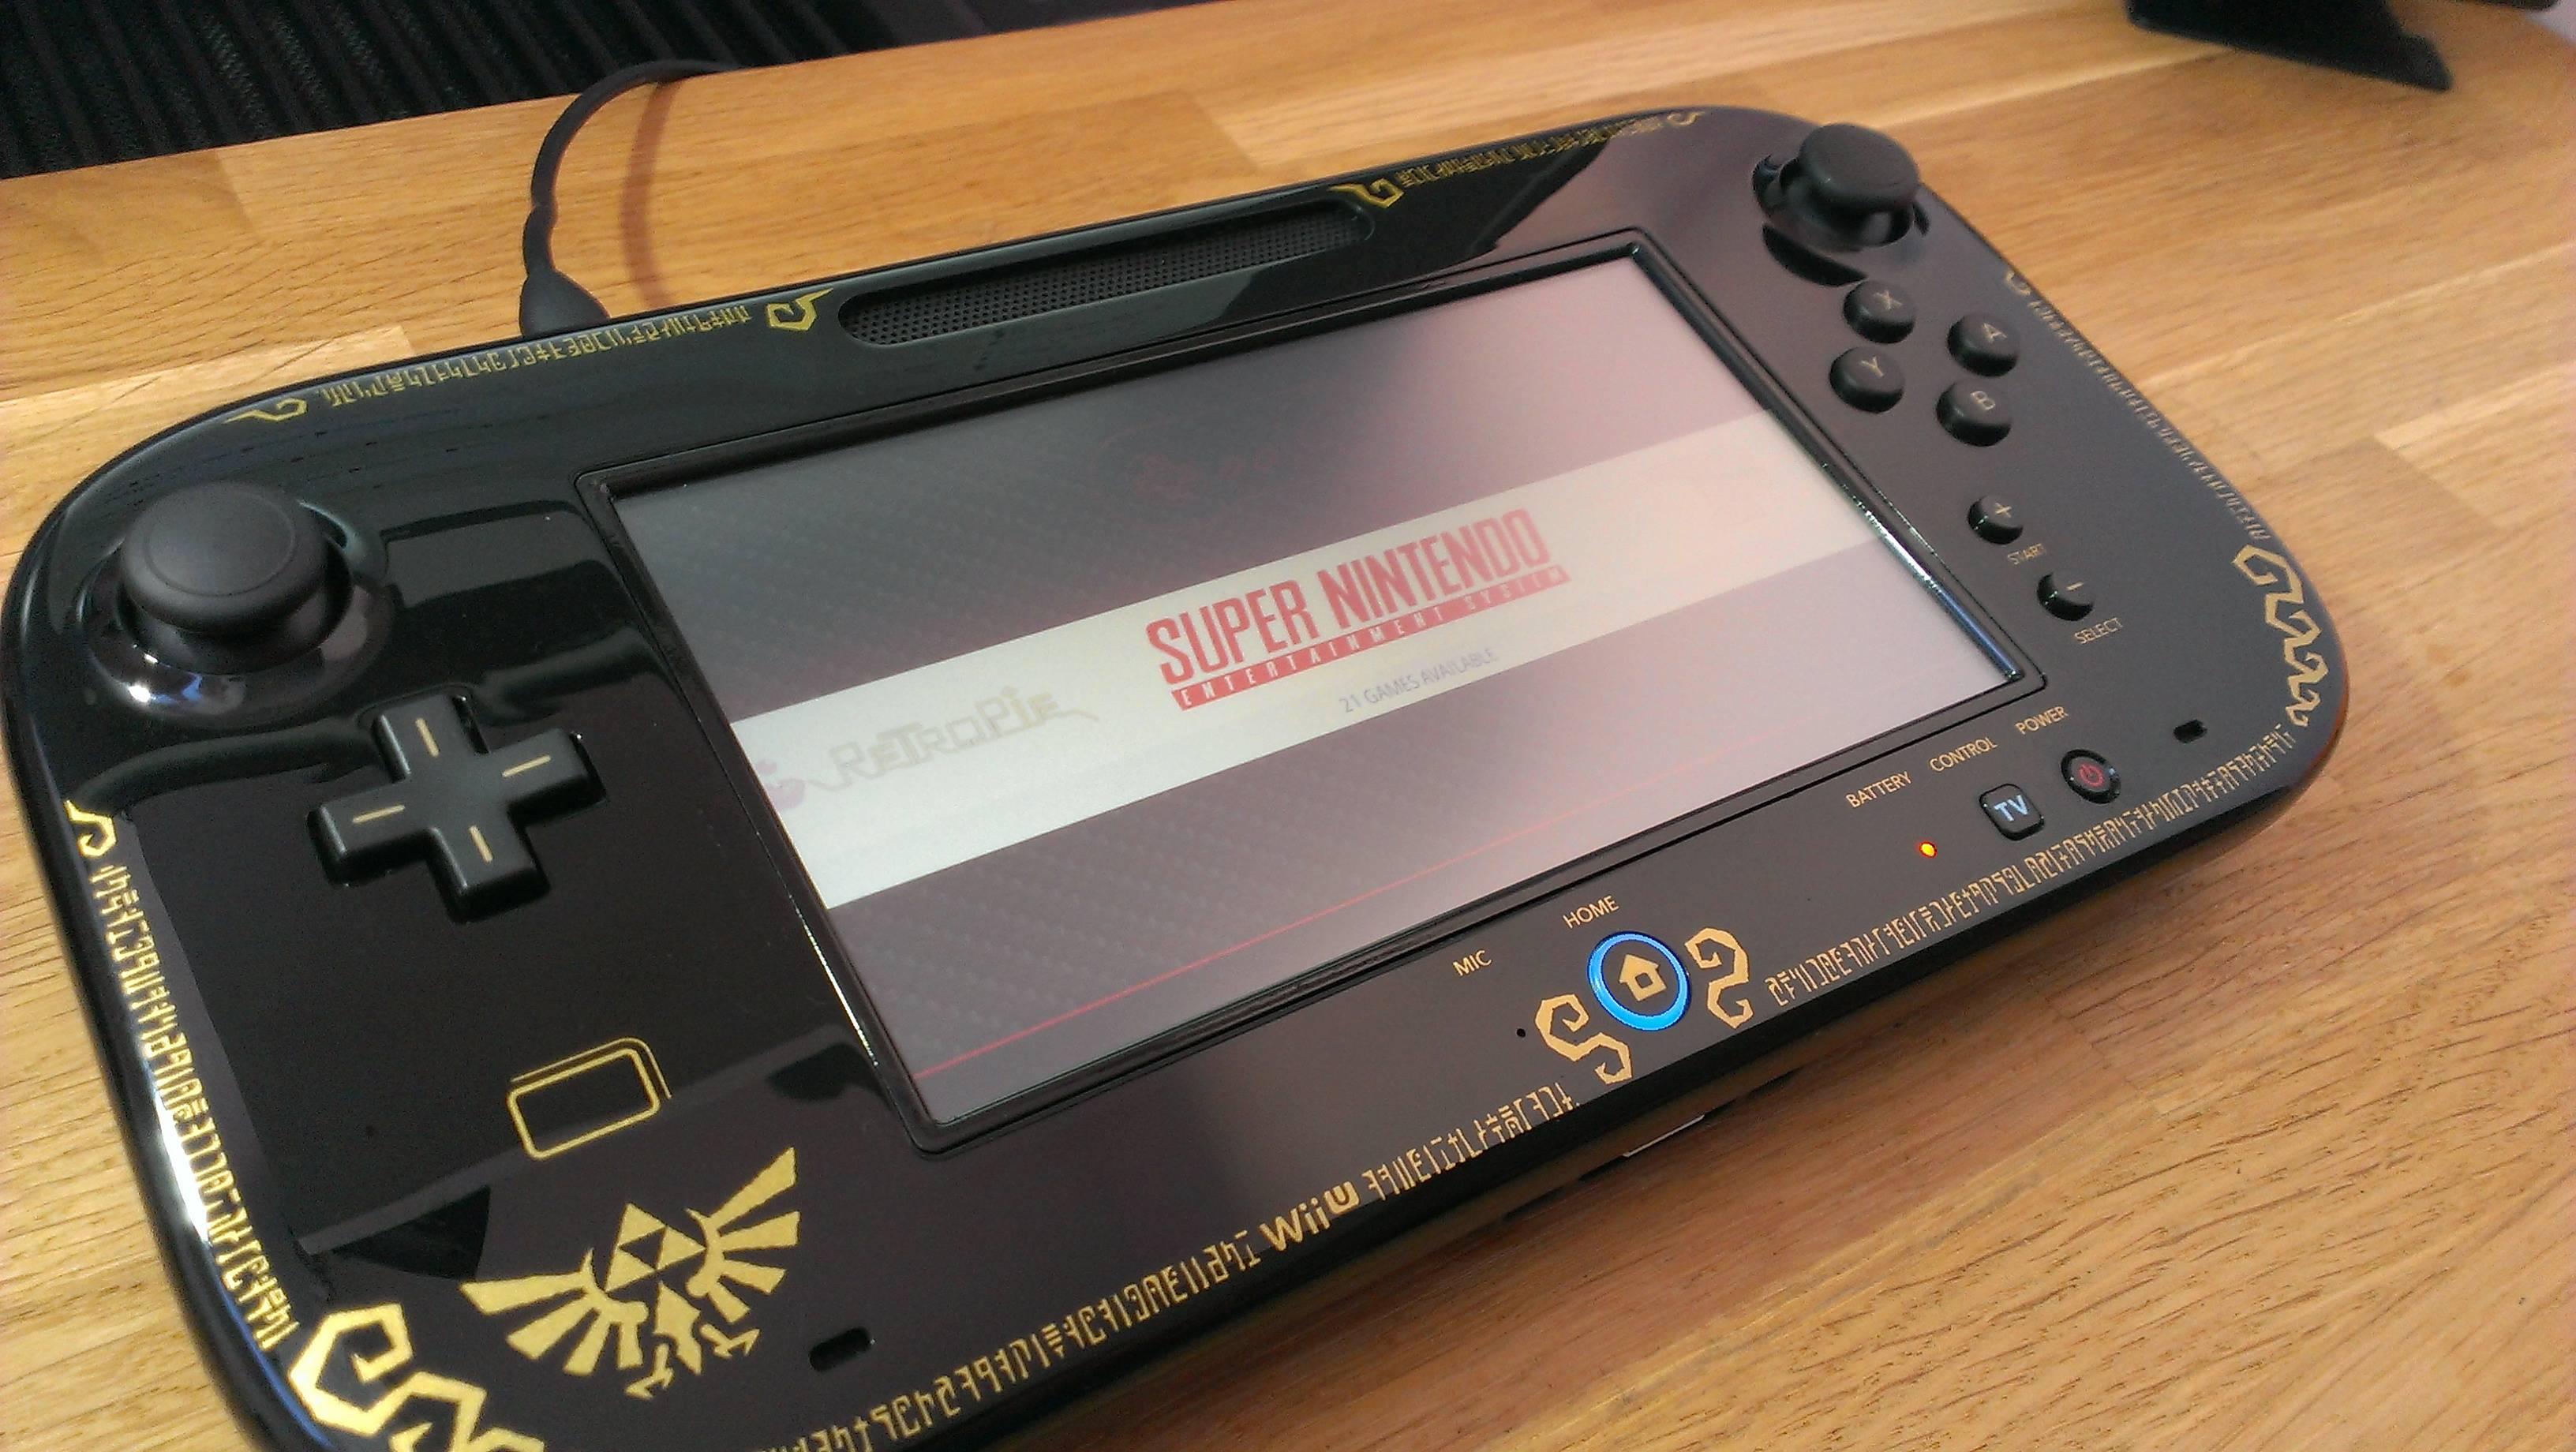 Wii U RetroPie Console Looks Gorgeous | Hackaday